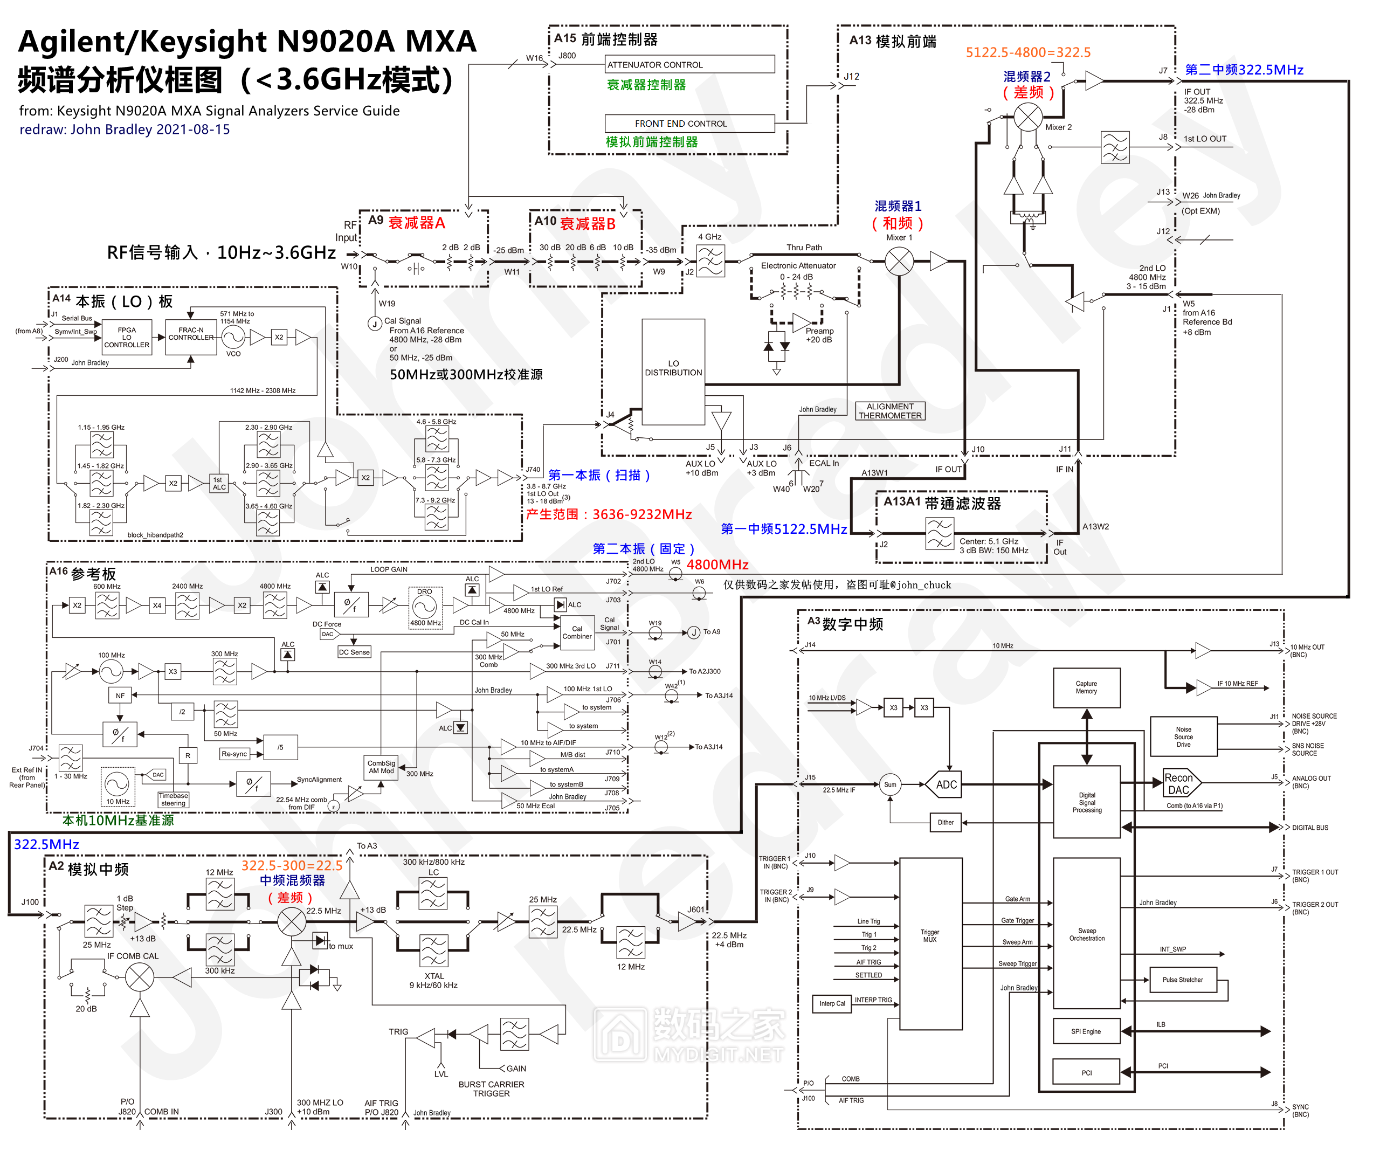 N9020A-3.6G-框图 - 水印.png